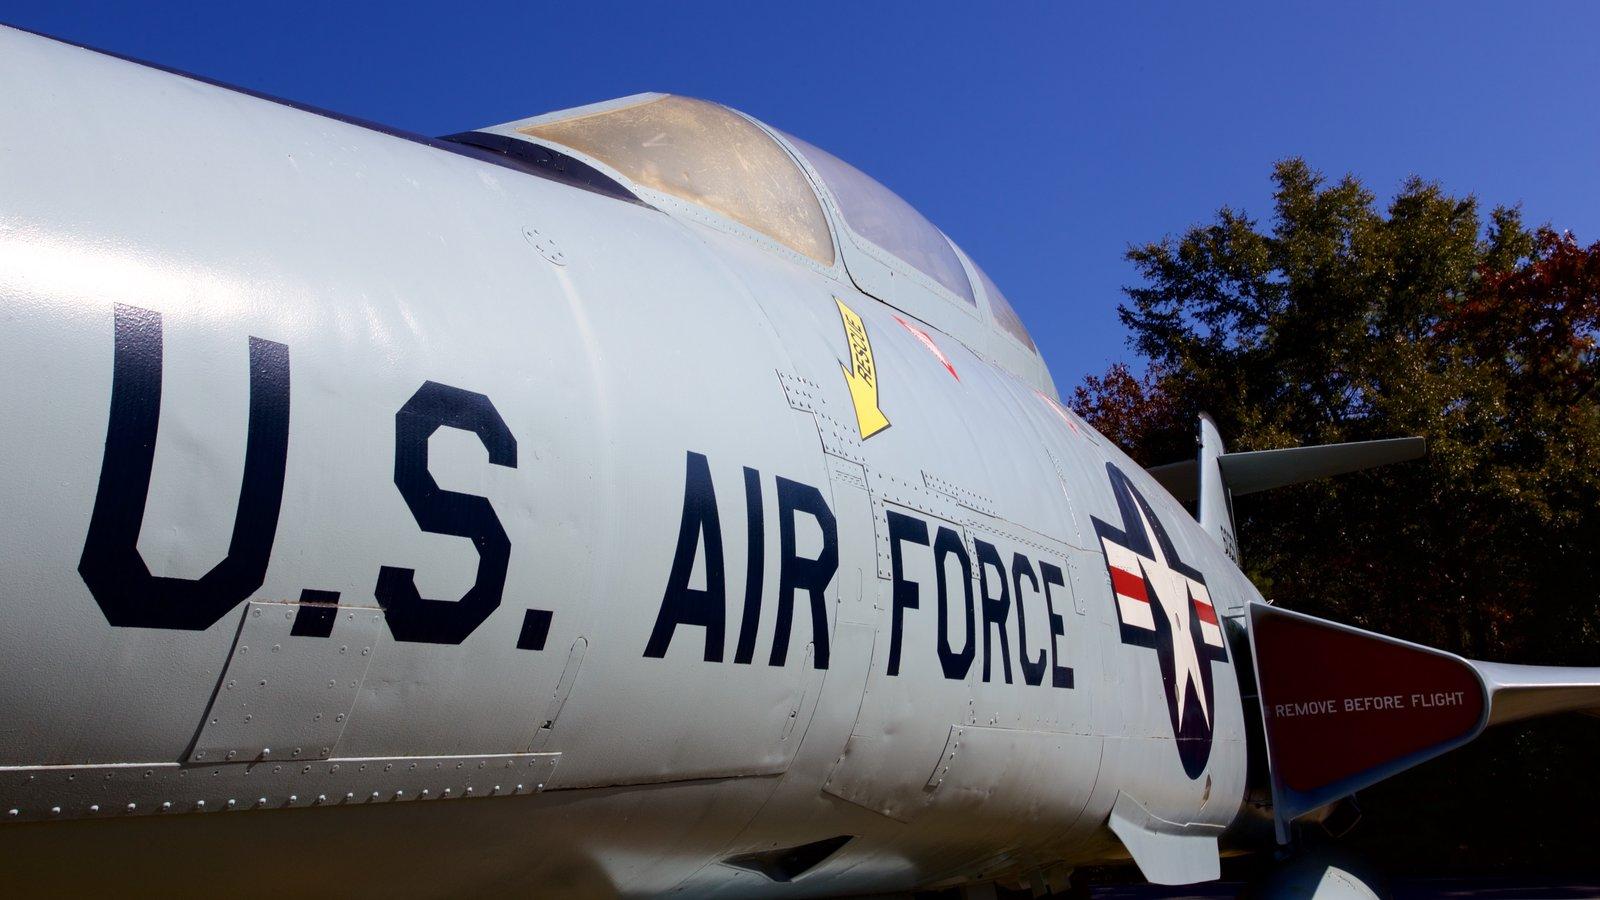 Air Force Armament Museum